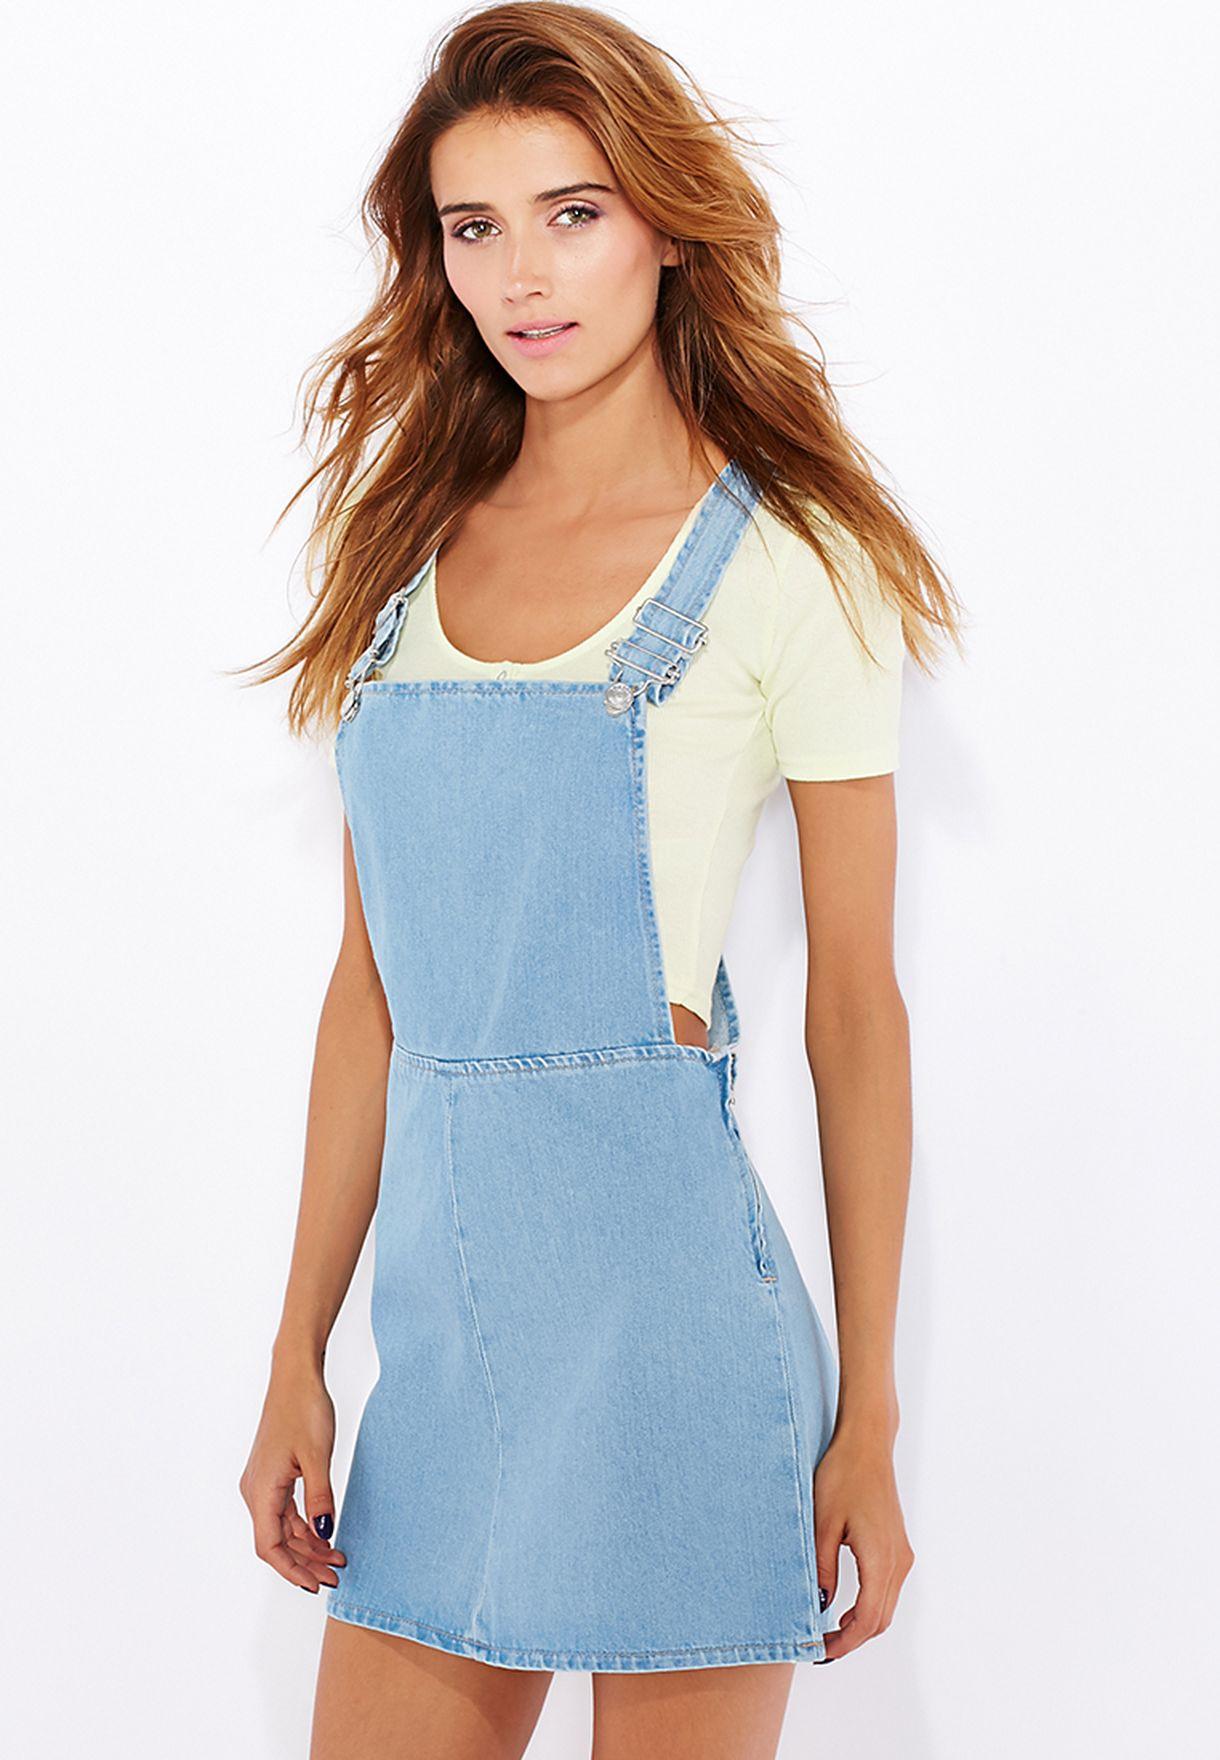 a4688ed701c50 Shop Topshop blue Denim Pinafore Dress 05G15HMDT for Women in ...